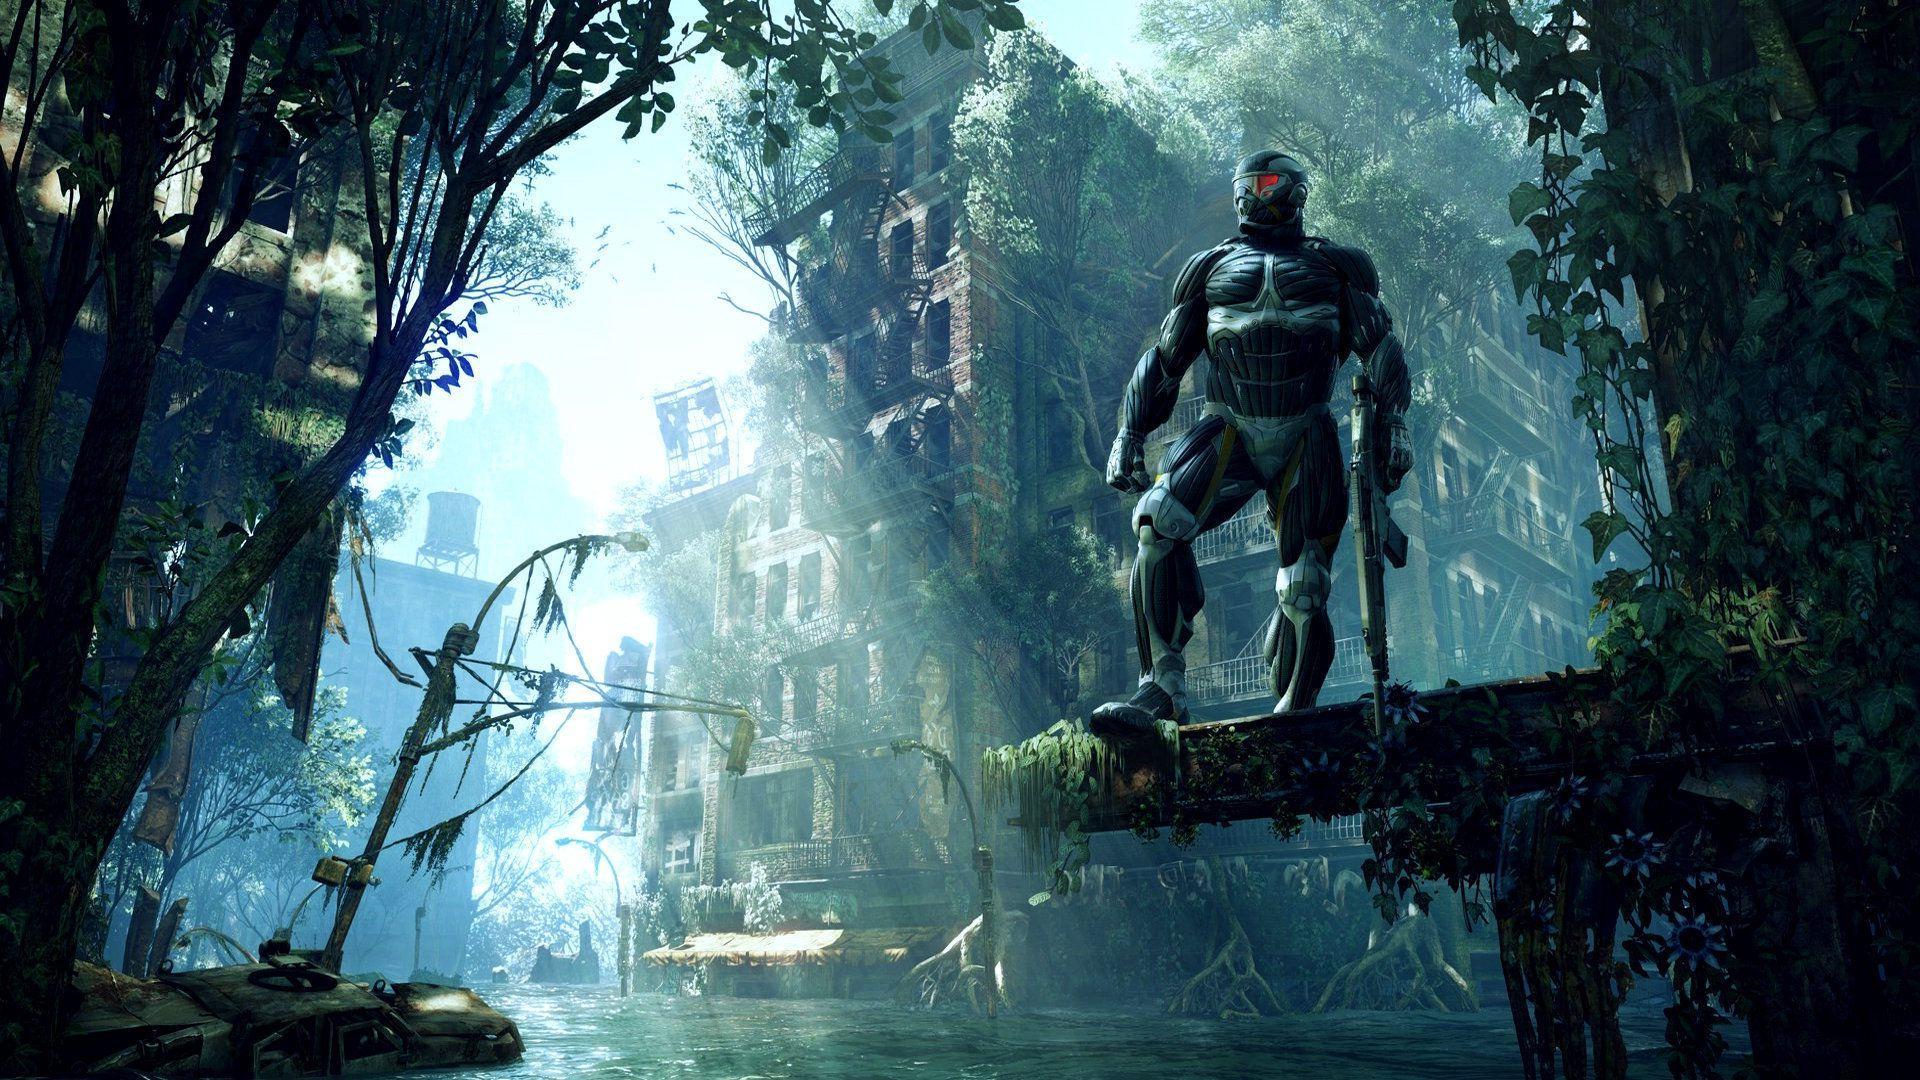 Crysis 3 City Wallpapers Top Free Crysis 3 City